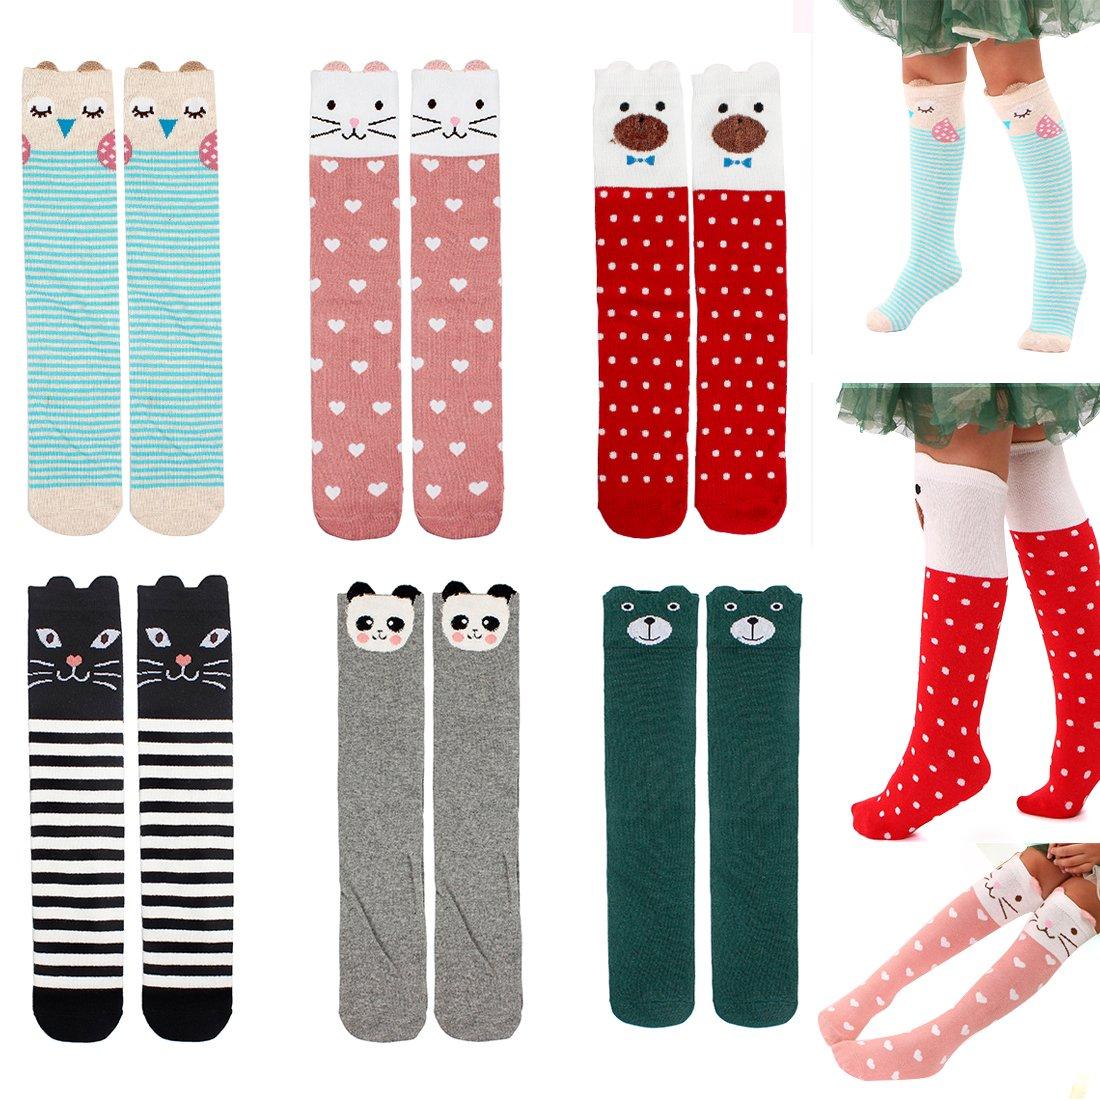 Menghao 6 pairs Girls Cute Over Calf Knee High Socks - Kids Child Cartoon Animal Cat Fox Bear Cotton Stockings